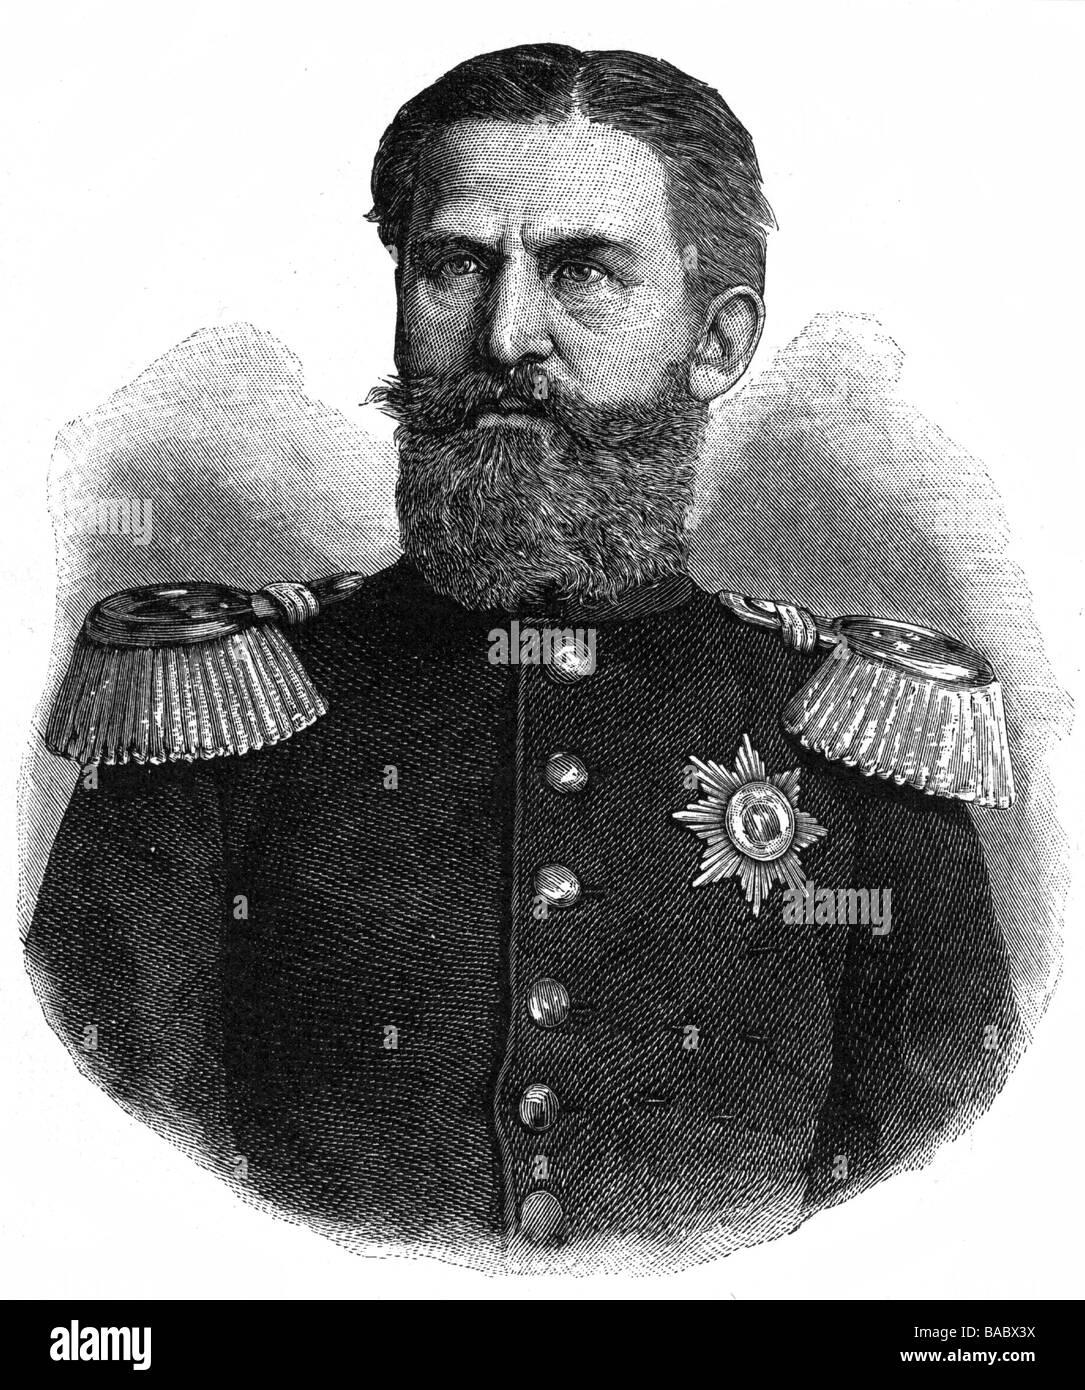 Henry XIV, 28.5.1832 - 29.3.1913, Prince of Reuss (younger dynasty), from 11.7.1867, regent of Reuss (older dynasty), - Stock Image